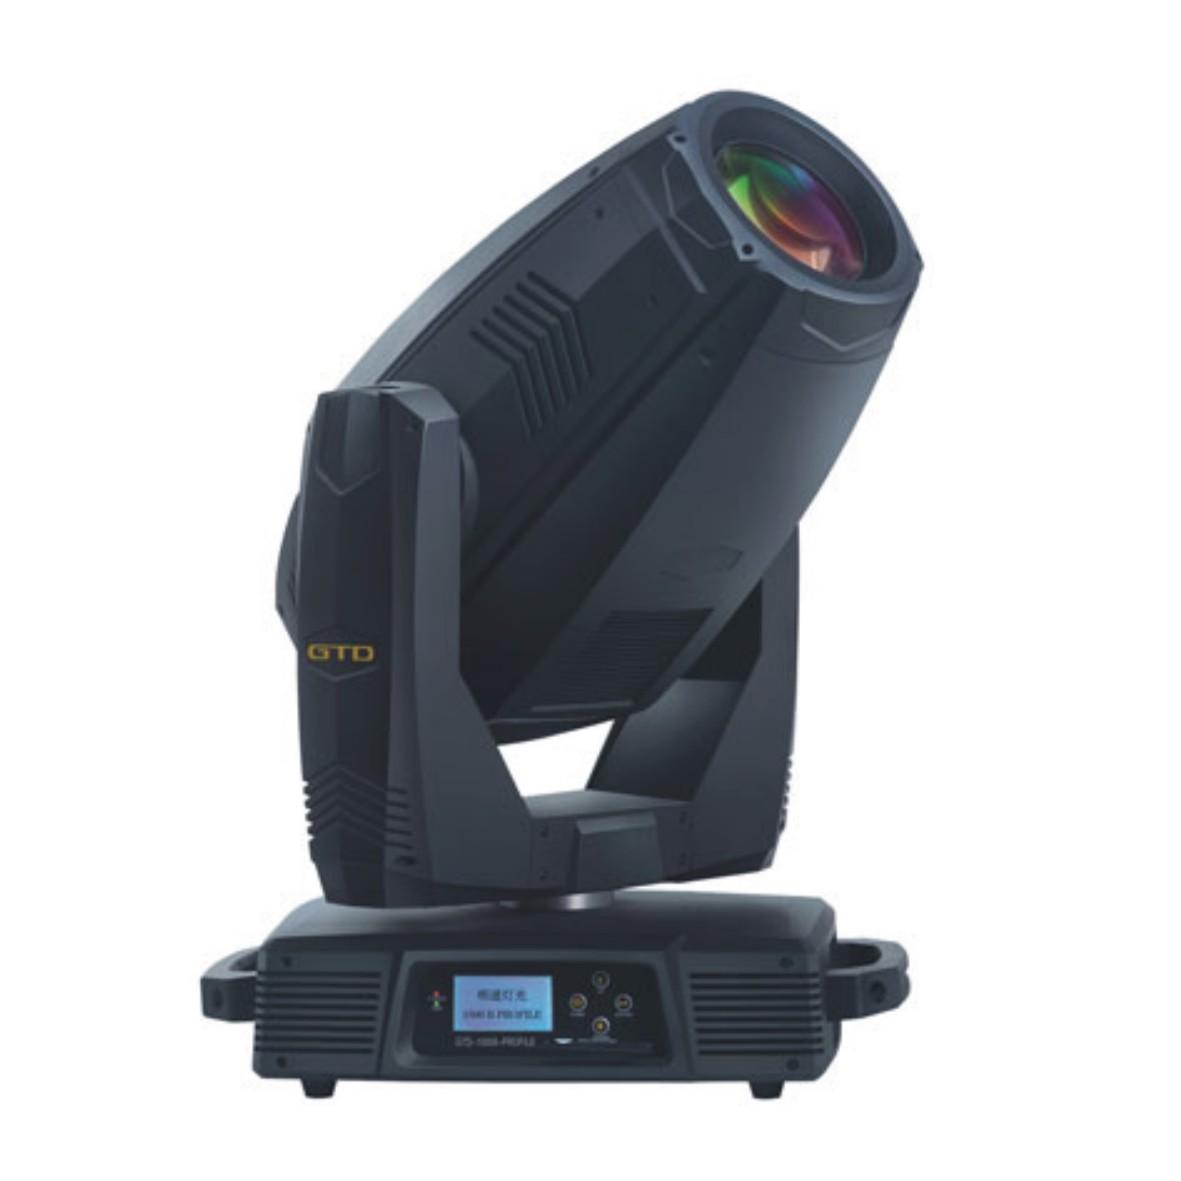 GTD-1500 II PROFILE 电脑摇头切割灯